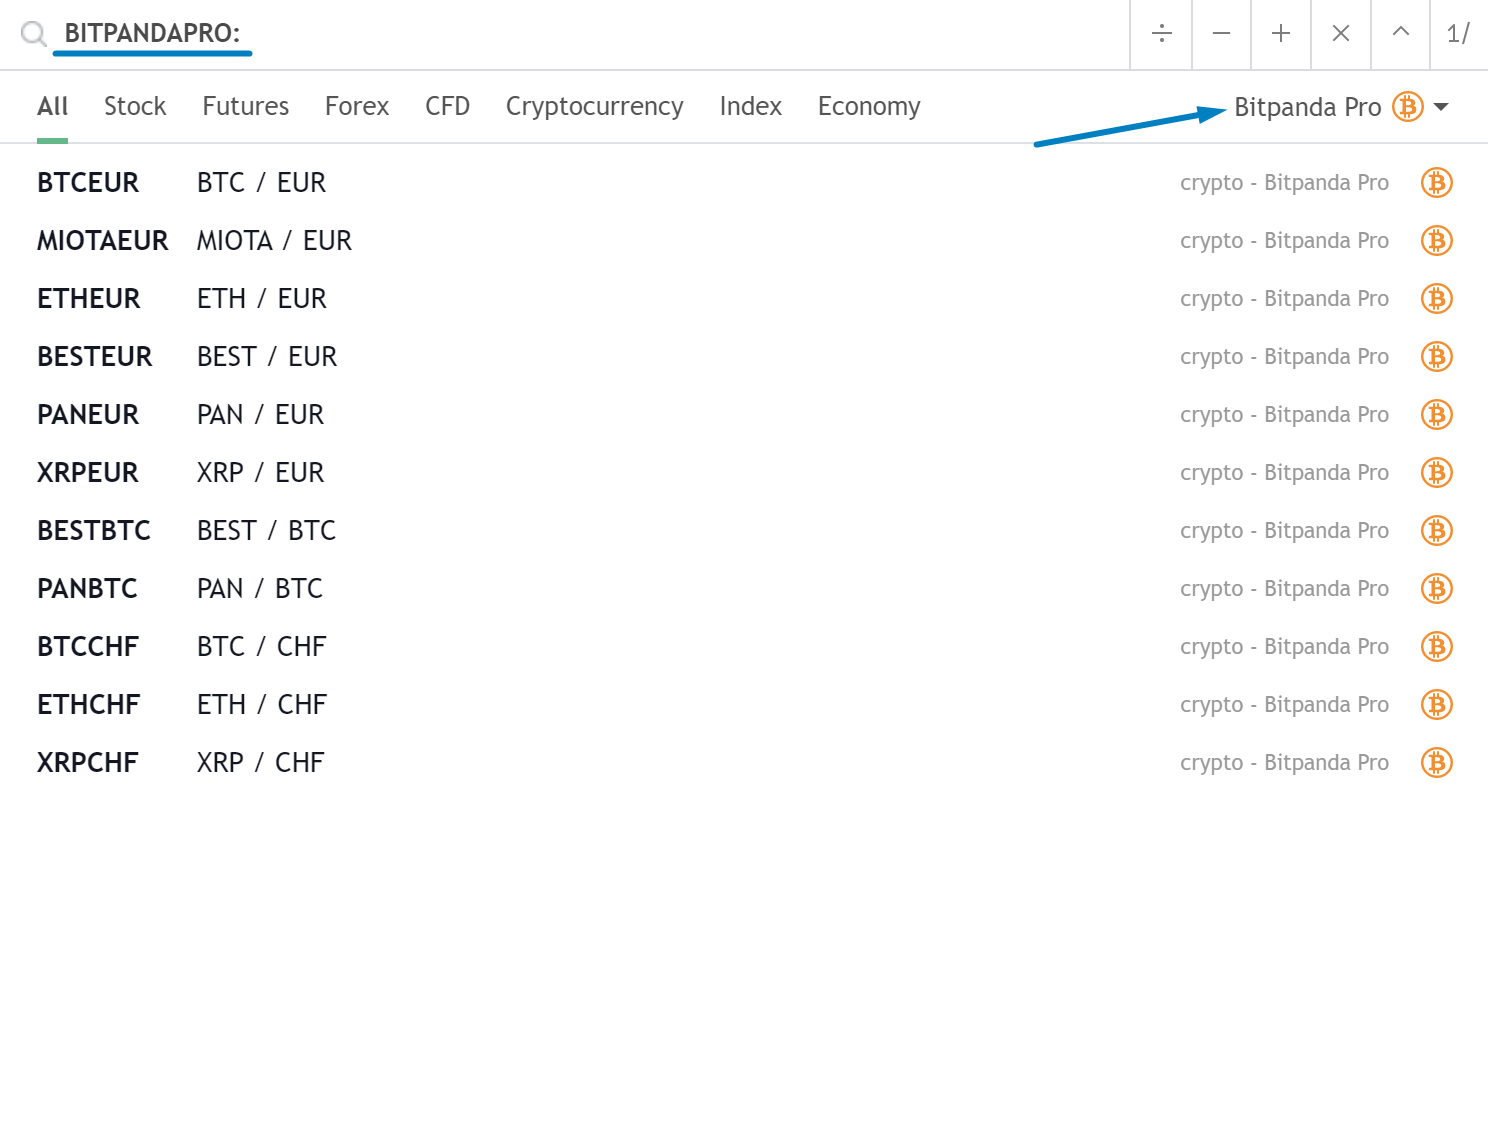 bitpanda pro tradingview